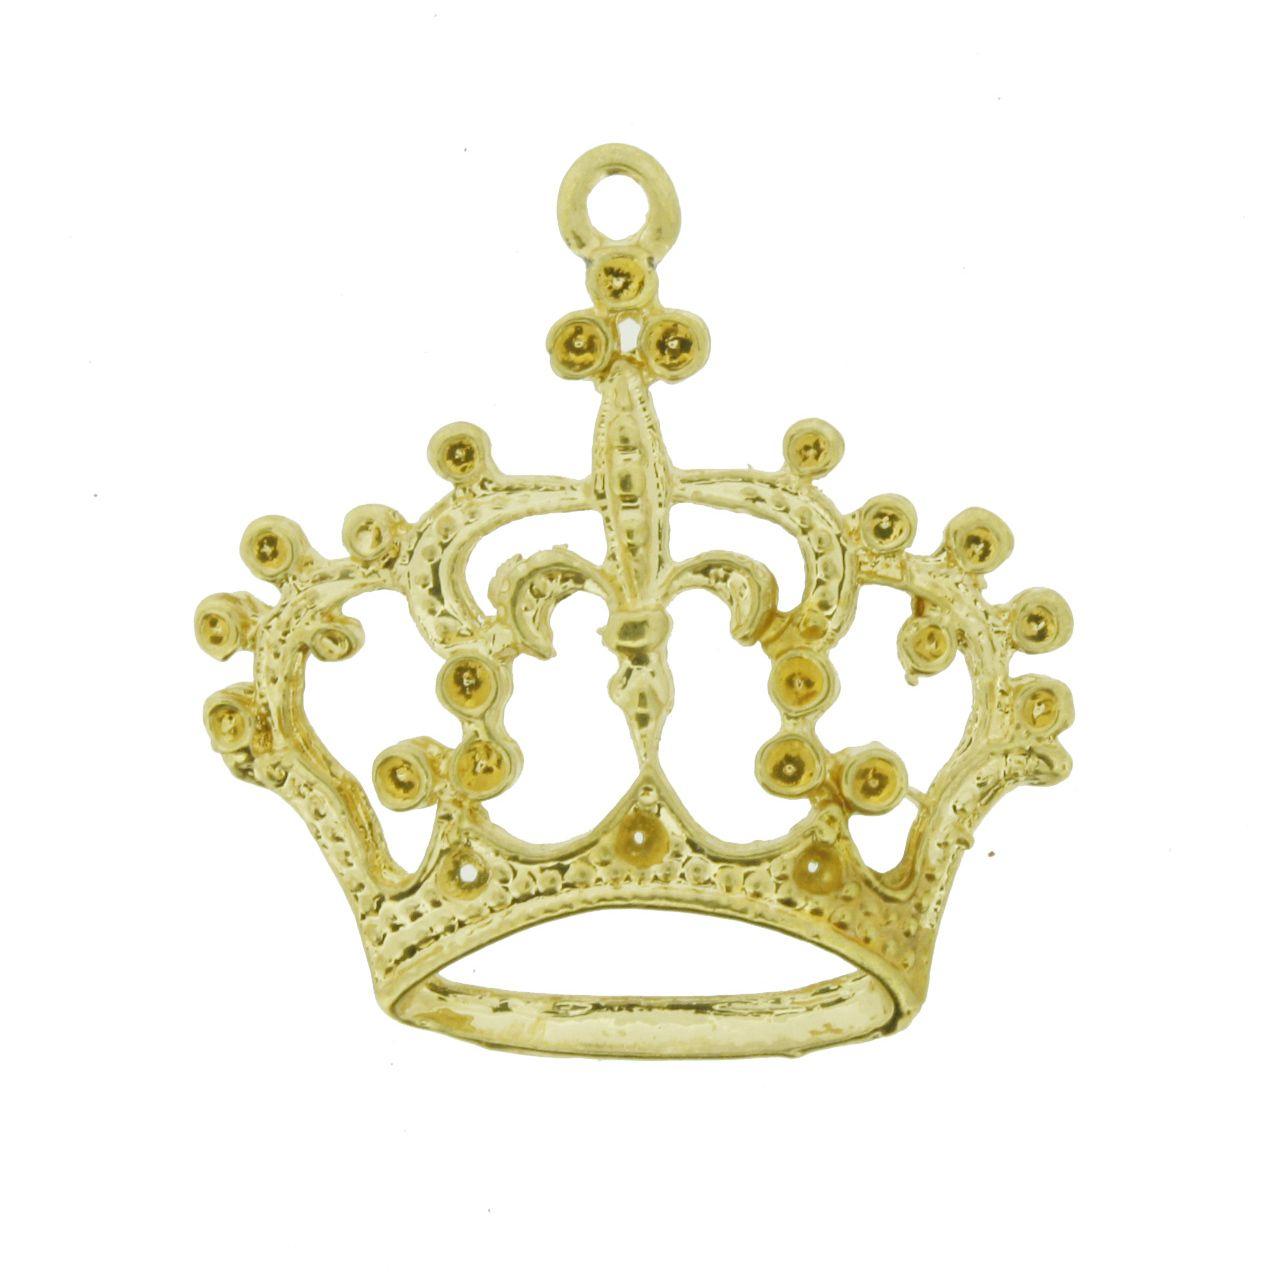 Coroa Dourada - 28mm  - Universo Religioso® - Artigos de Umbanda e Candomblé